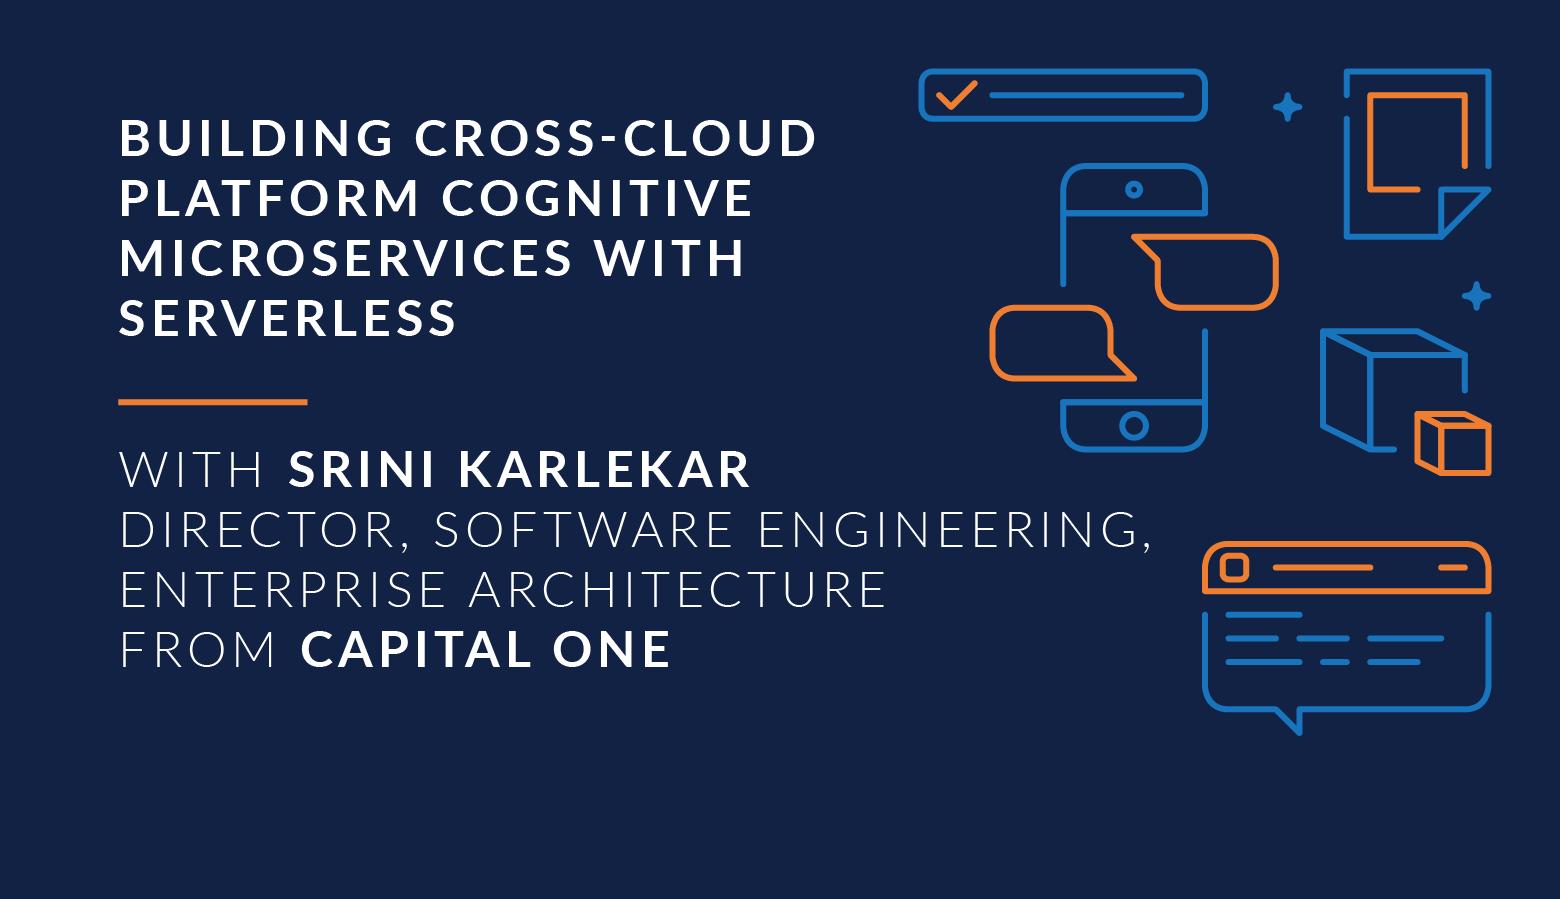 Building Cross-Cloud Platform Microservices Using Serverless